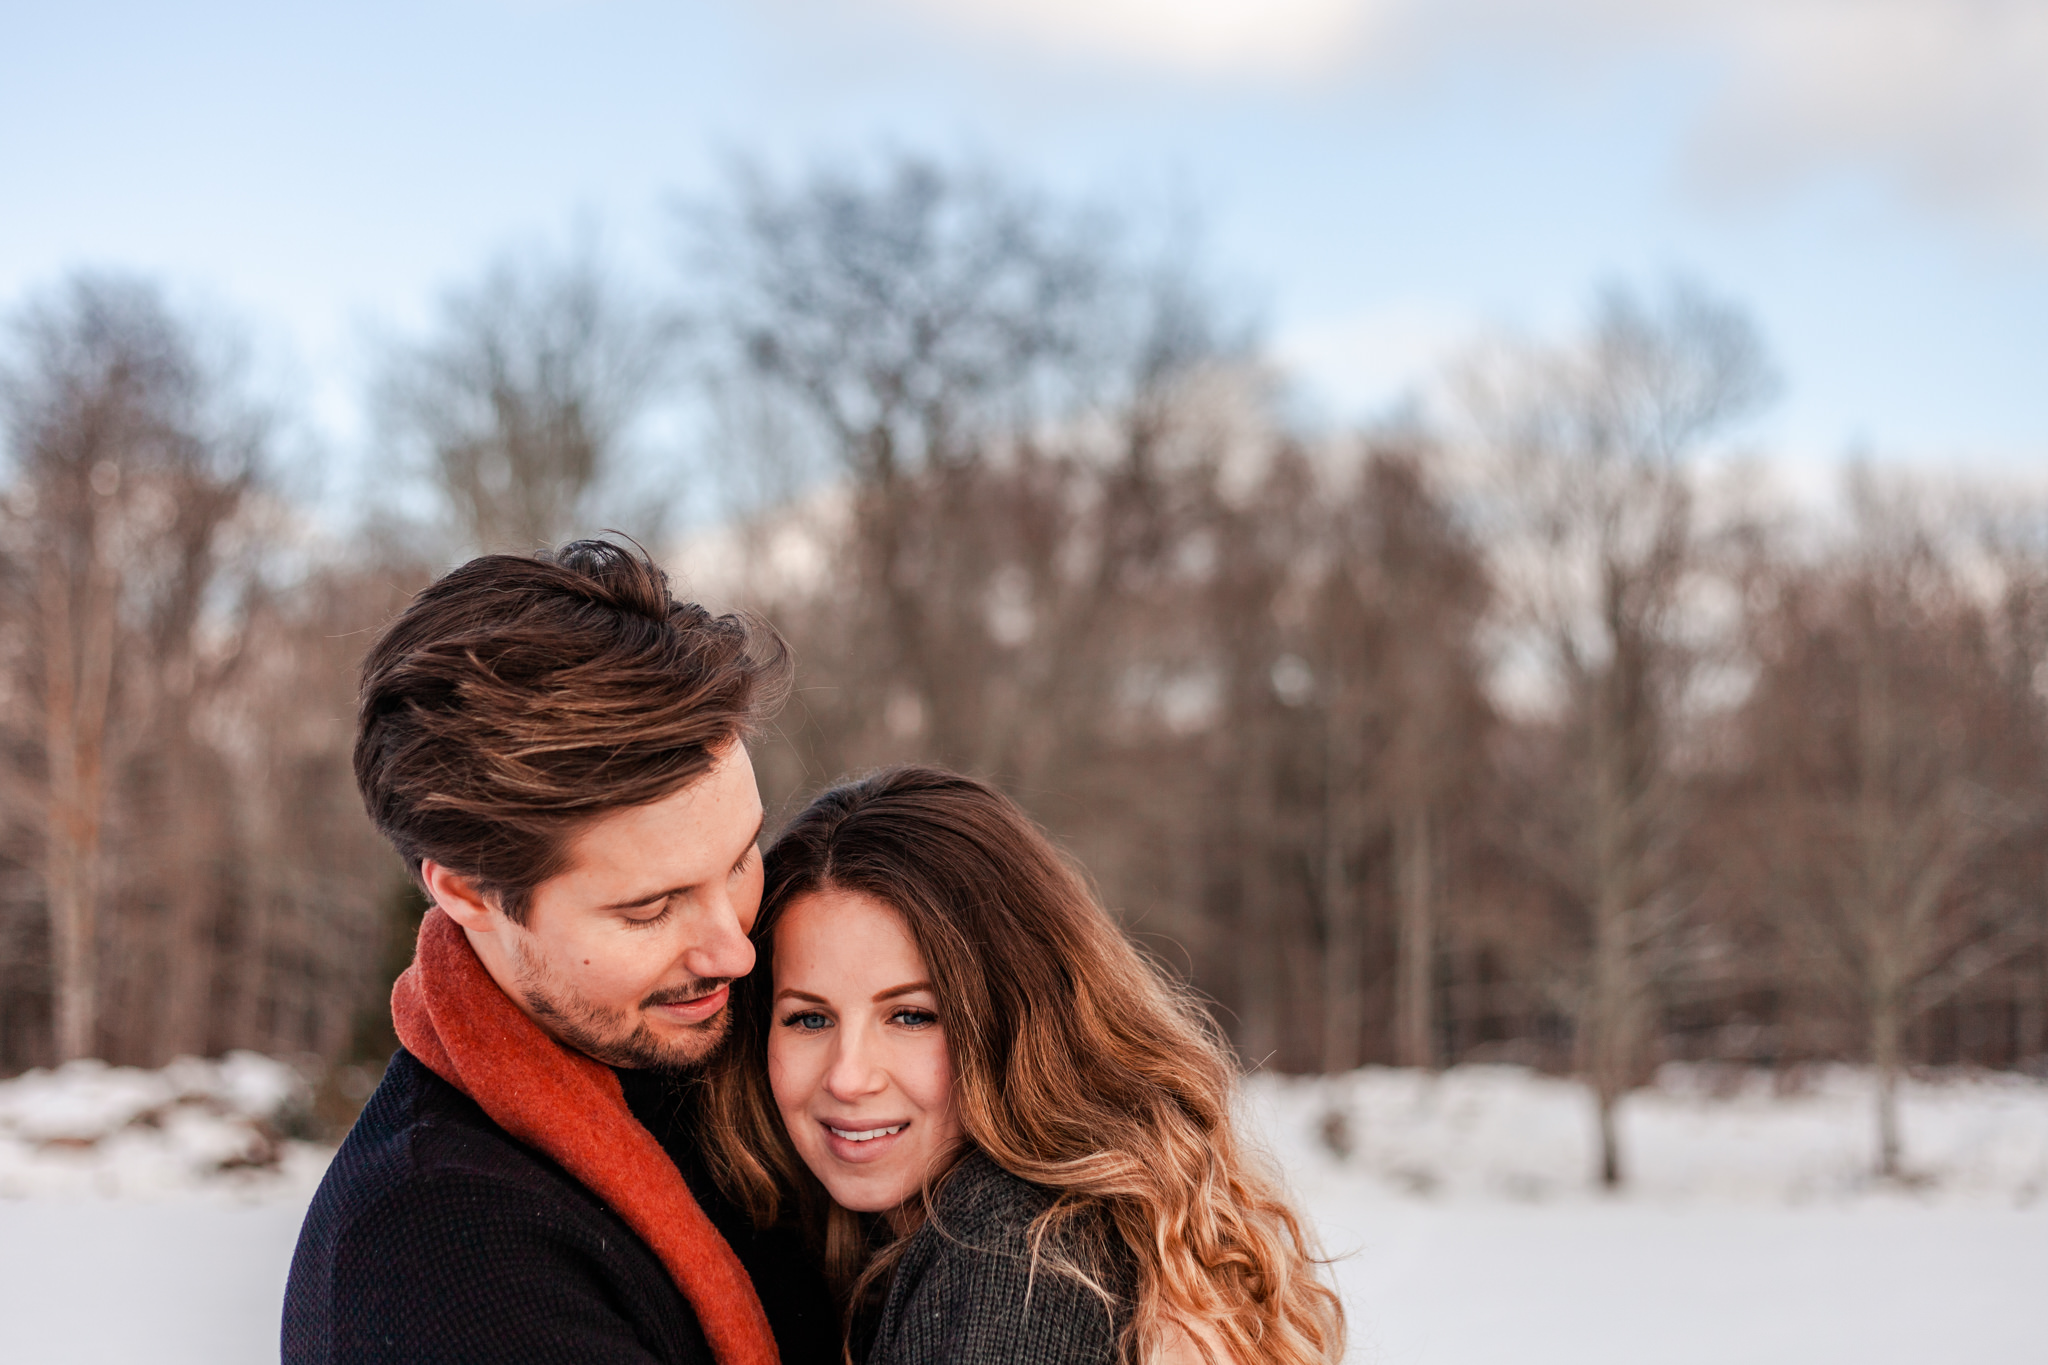 Provfotografering i snön i Småland